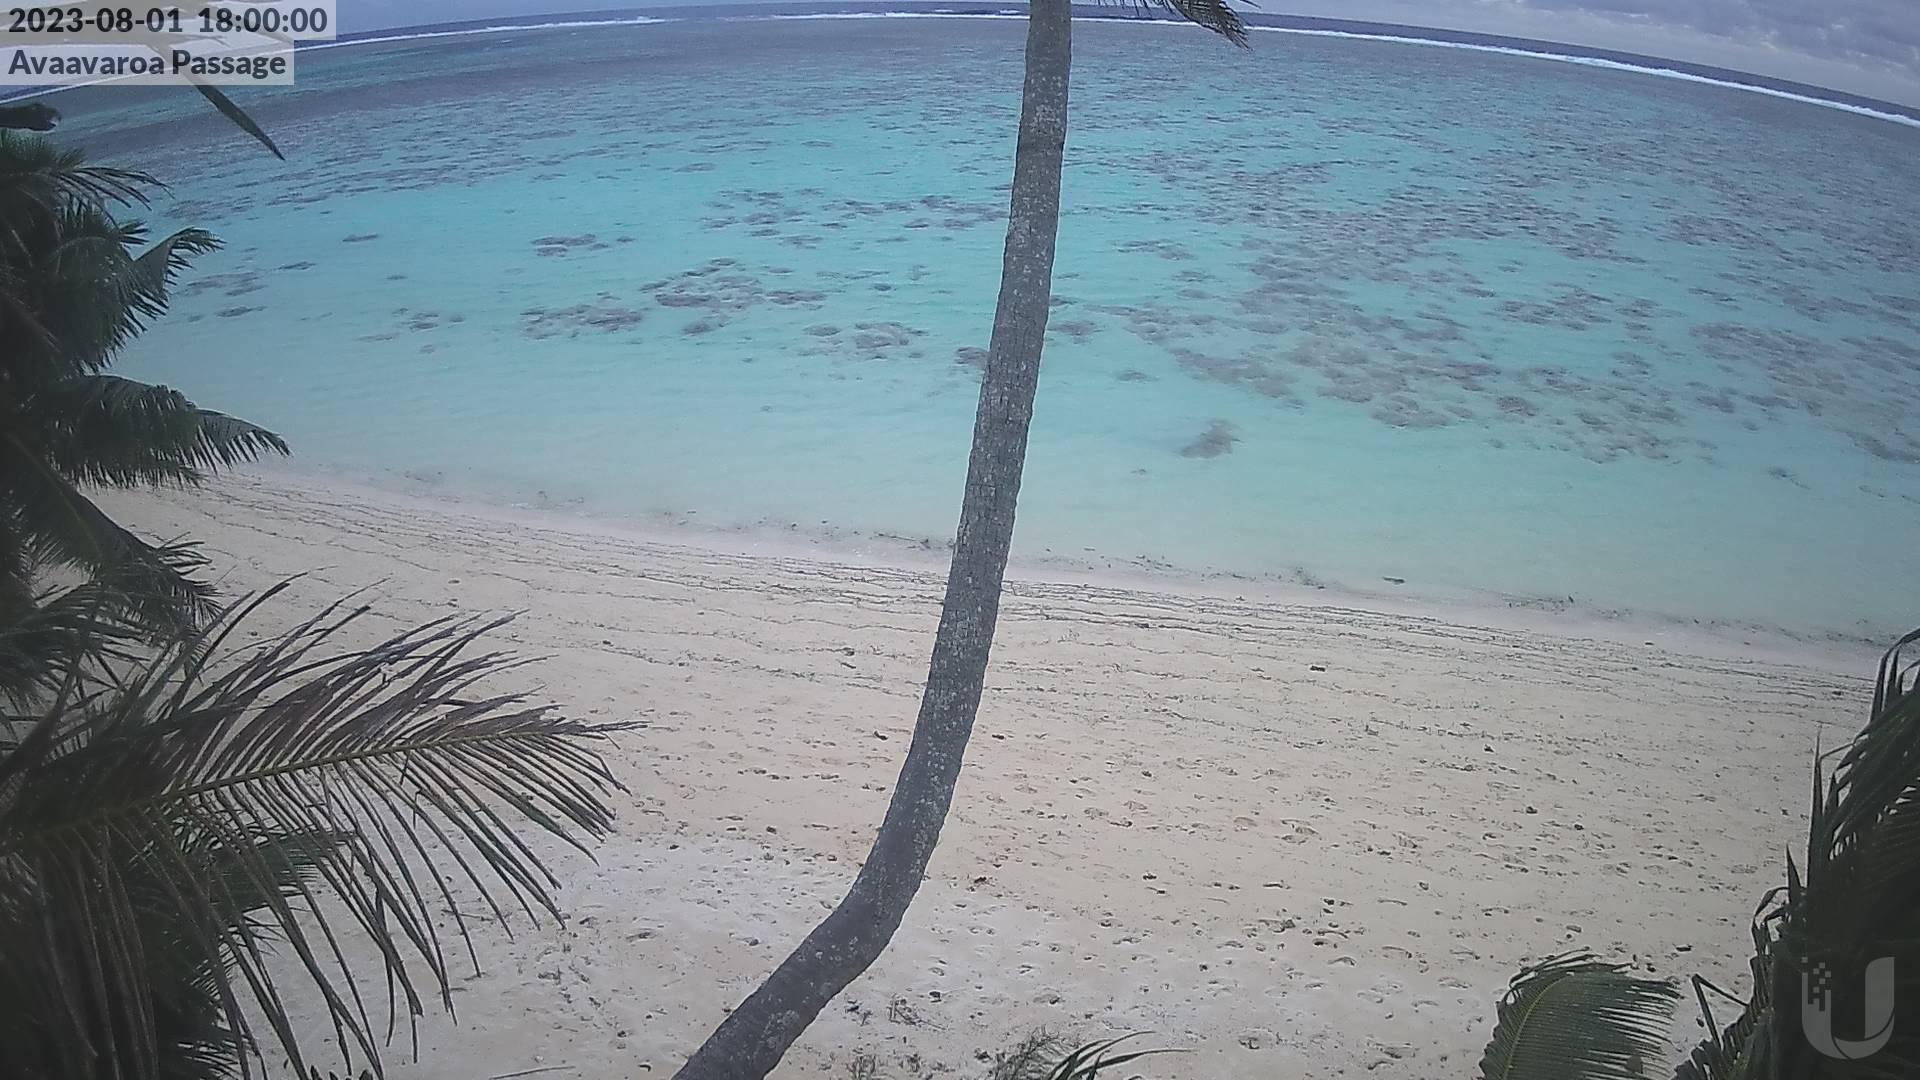 6:00 PM @ Avaavaroa Beach